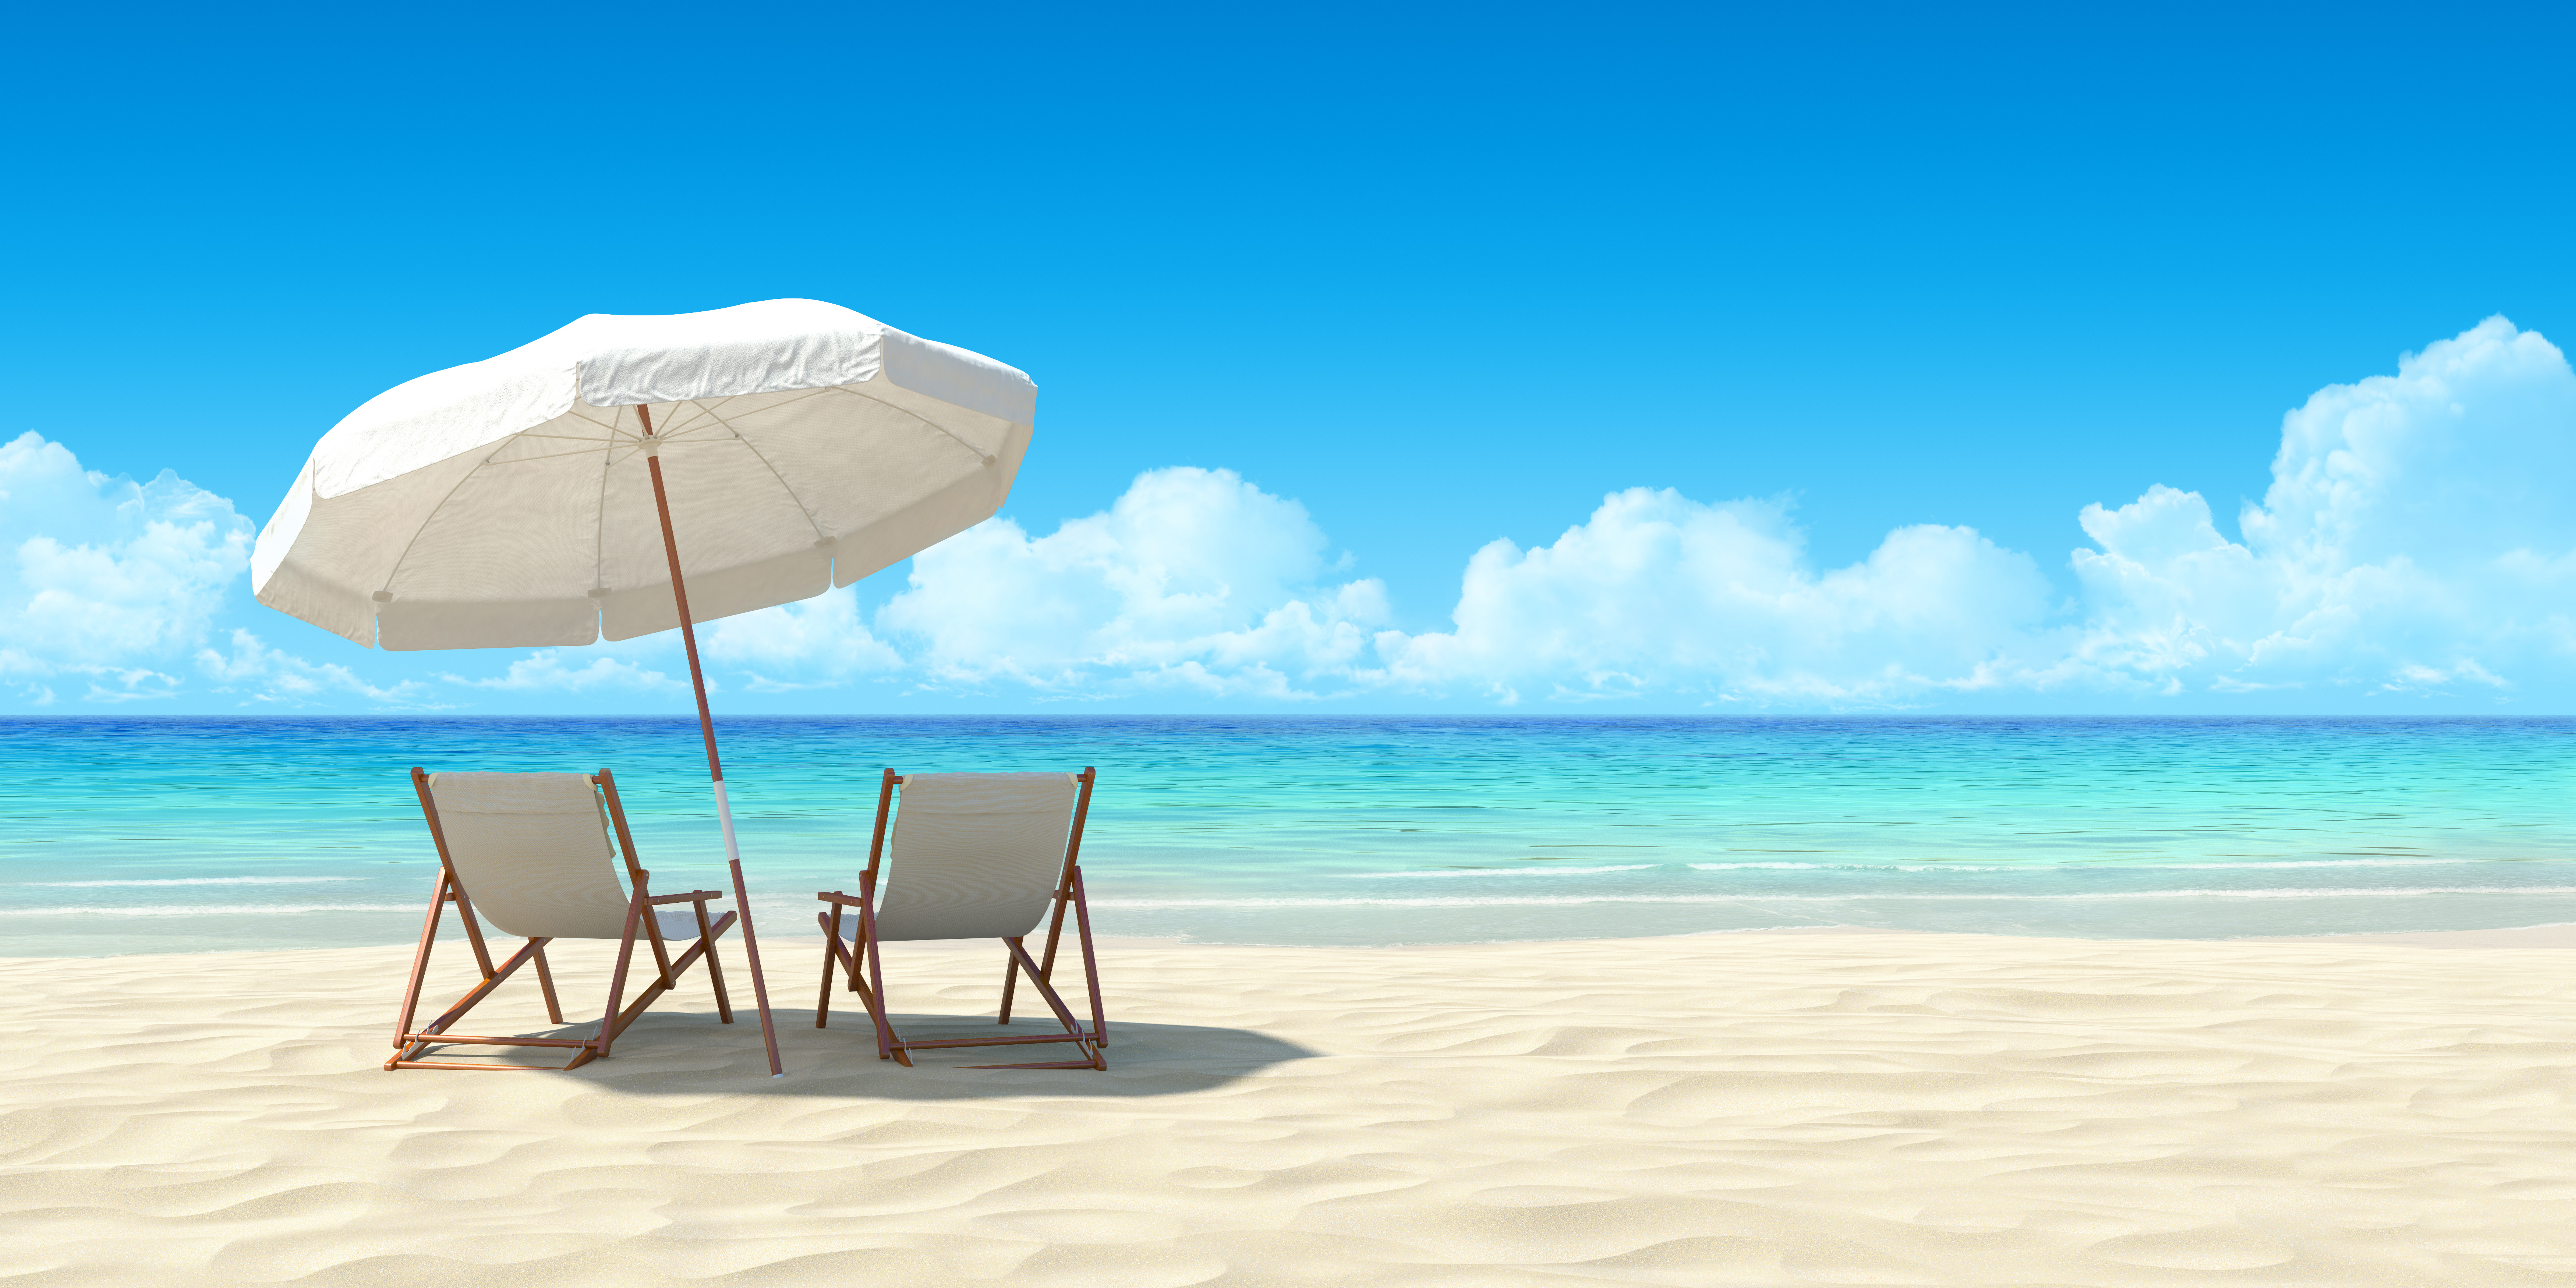 Beach Chair Wallpaper: Beach Chair Wallpaper